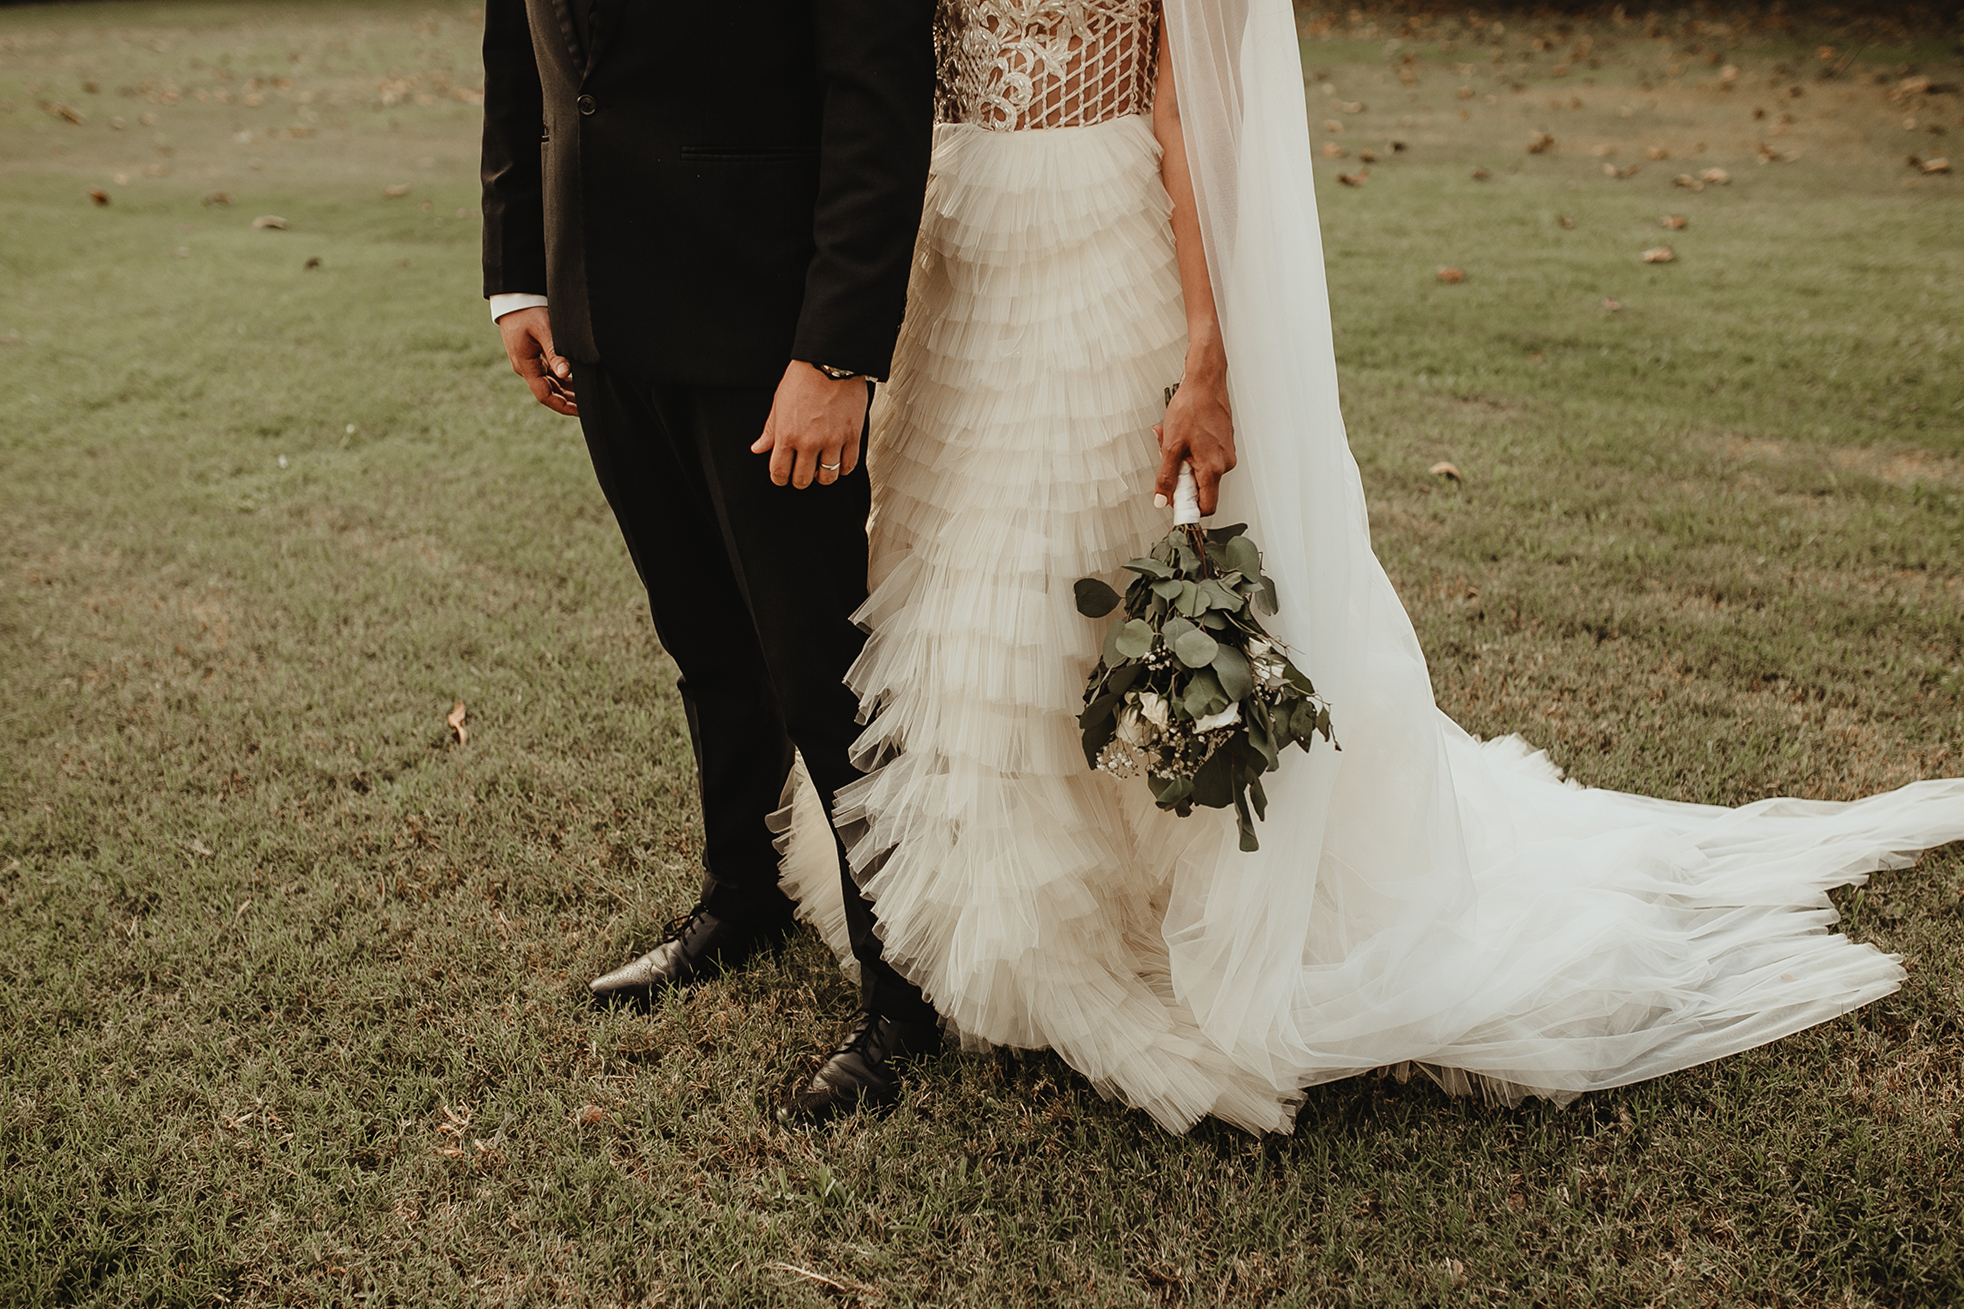 0838R&F__WeddingDestination_Weddingmerida_BodaMexico_FotografoDeBodas_FabrizioSimoneenFotografo.jpg